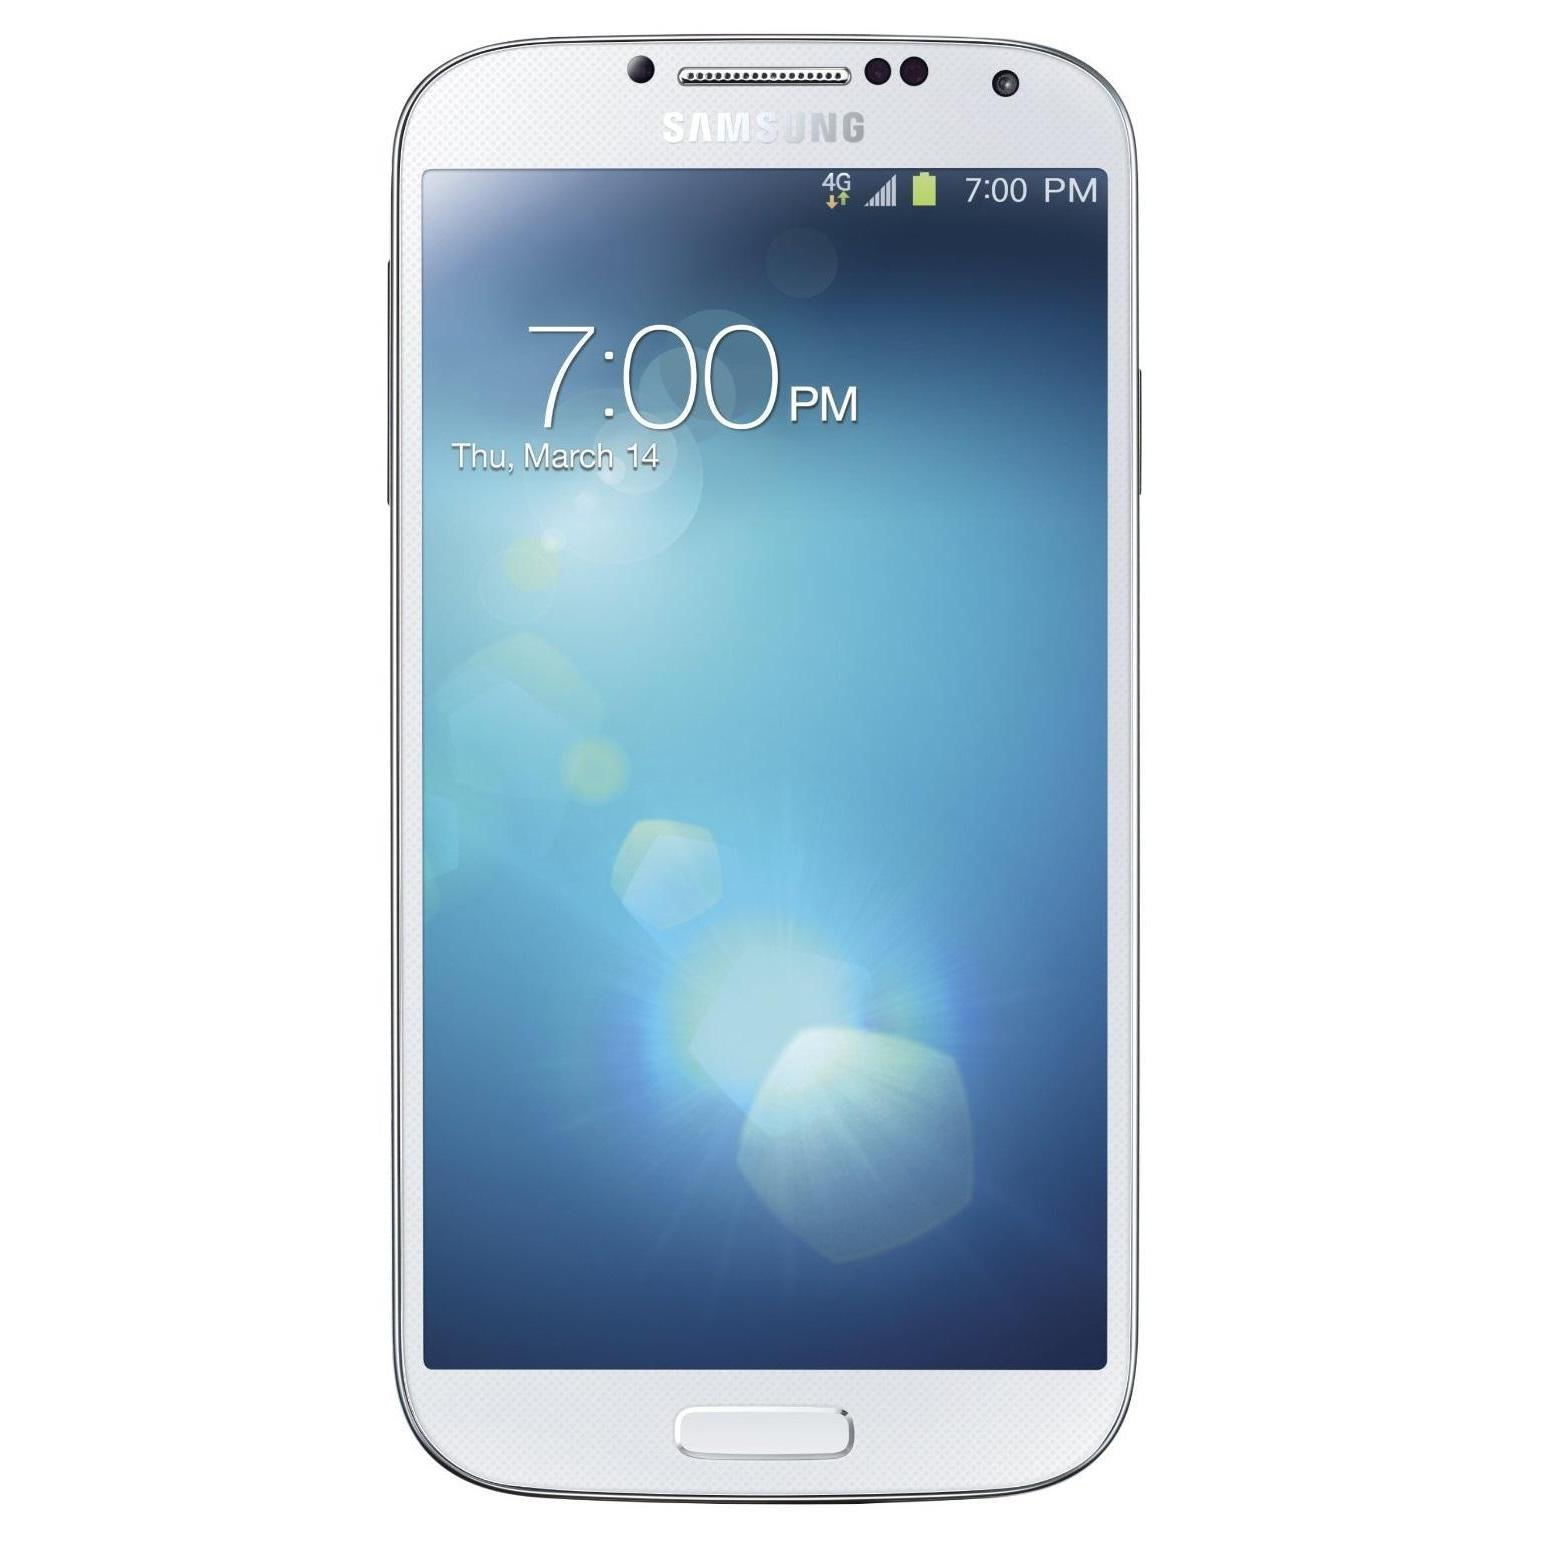 Sprint Samsung Galaxy S4 L720 16GB Smartphone (Unlocked),...